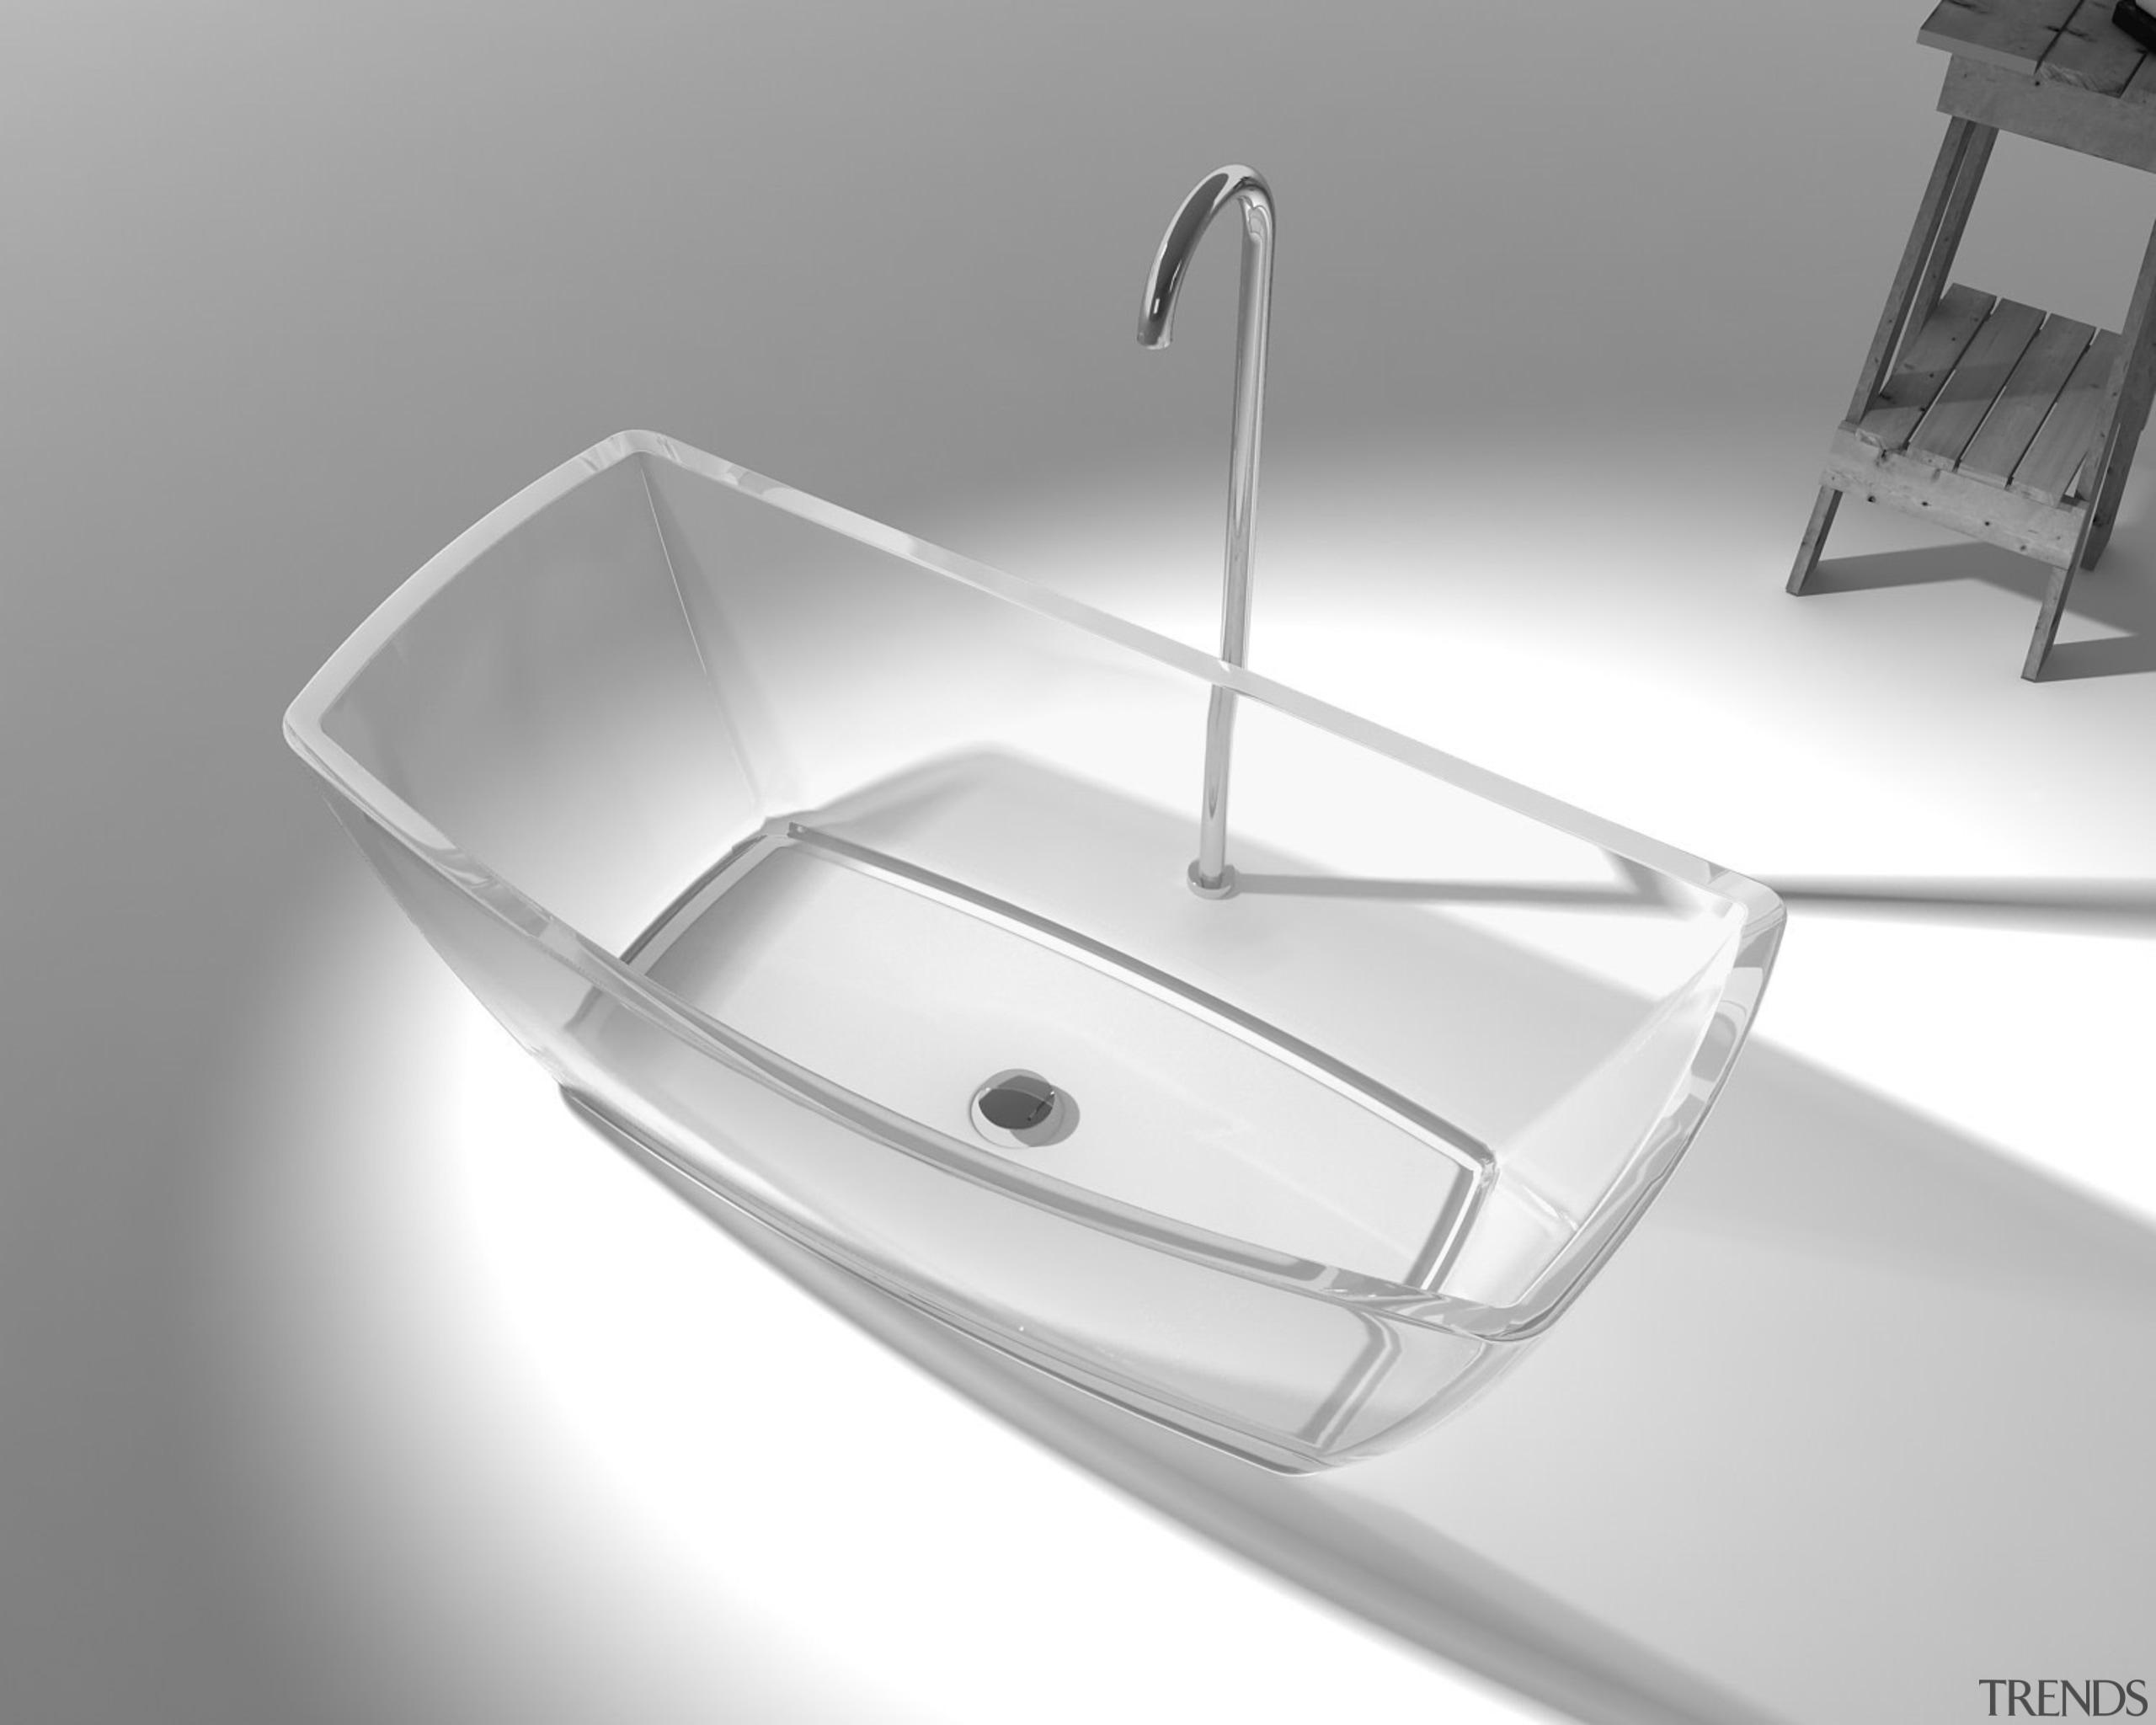 ZAAFDesigns Colour Design range includes shower columns, bathroom sink, boat, hardware, plumbing fixture, product, product design, sink, white, gray